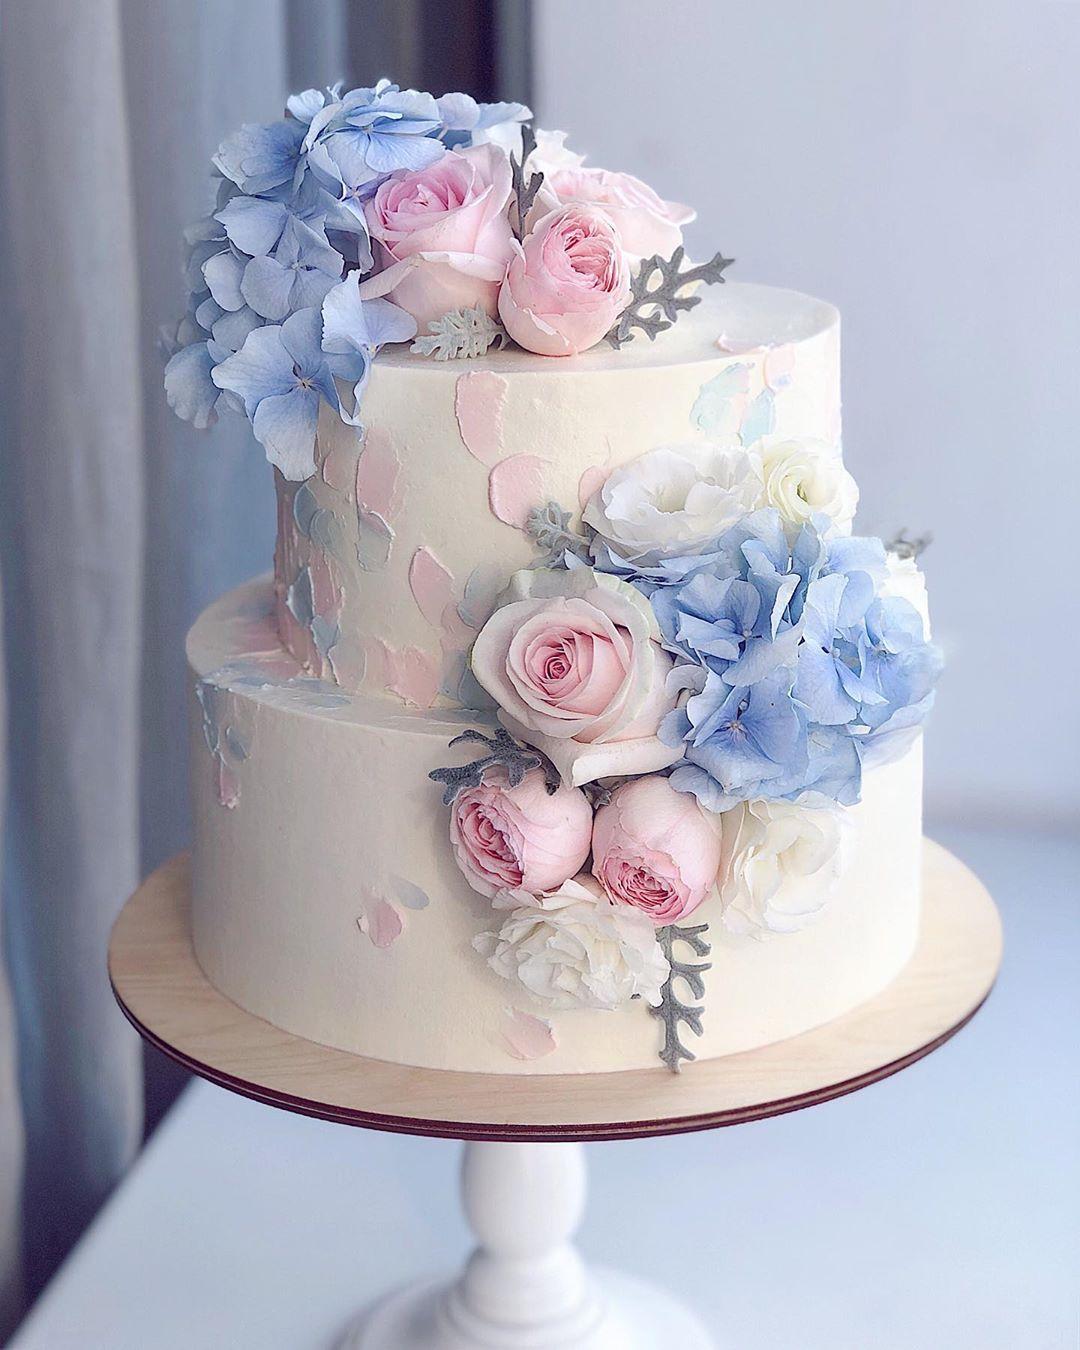 Beautiful Wedding Cakes Designs Inspo 2020 in 2020